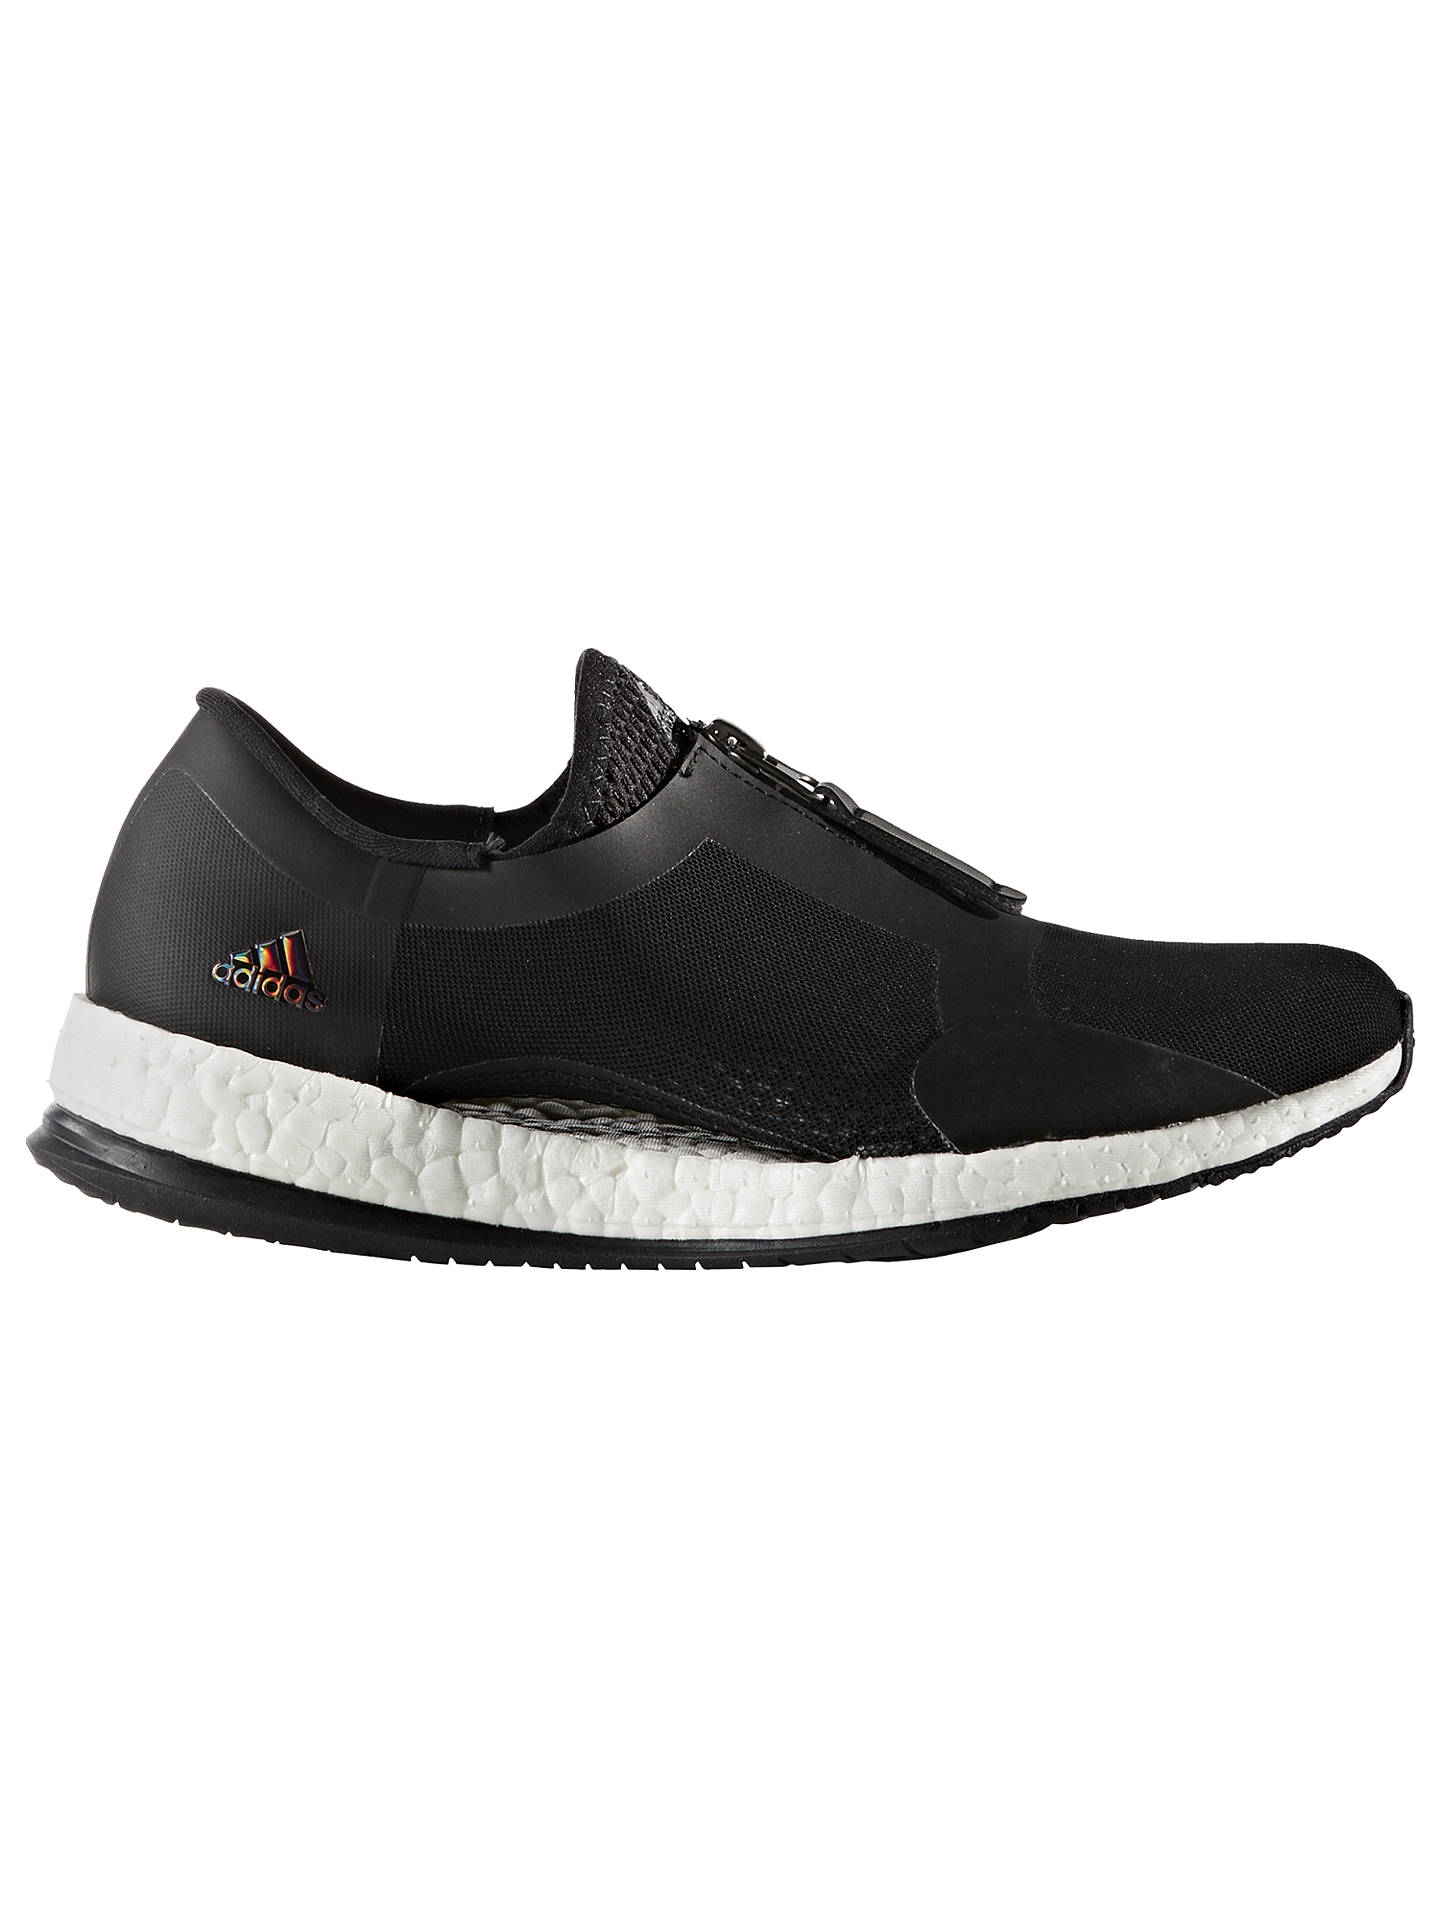 3fb282d5a Adidas Pure Boost X Zip Women s Cross Trainers